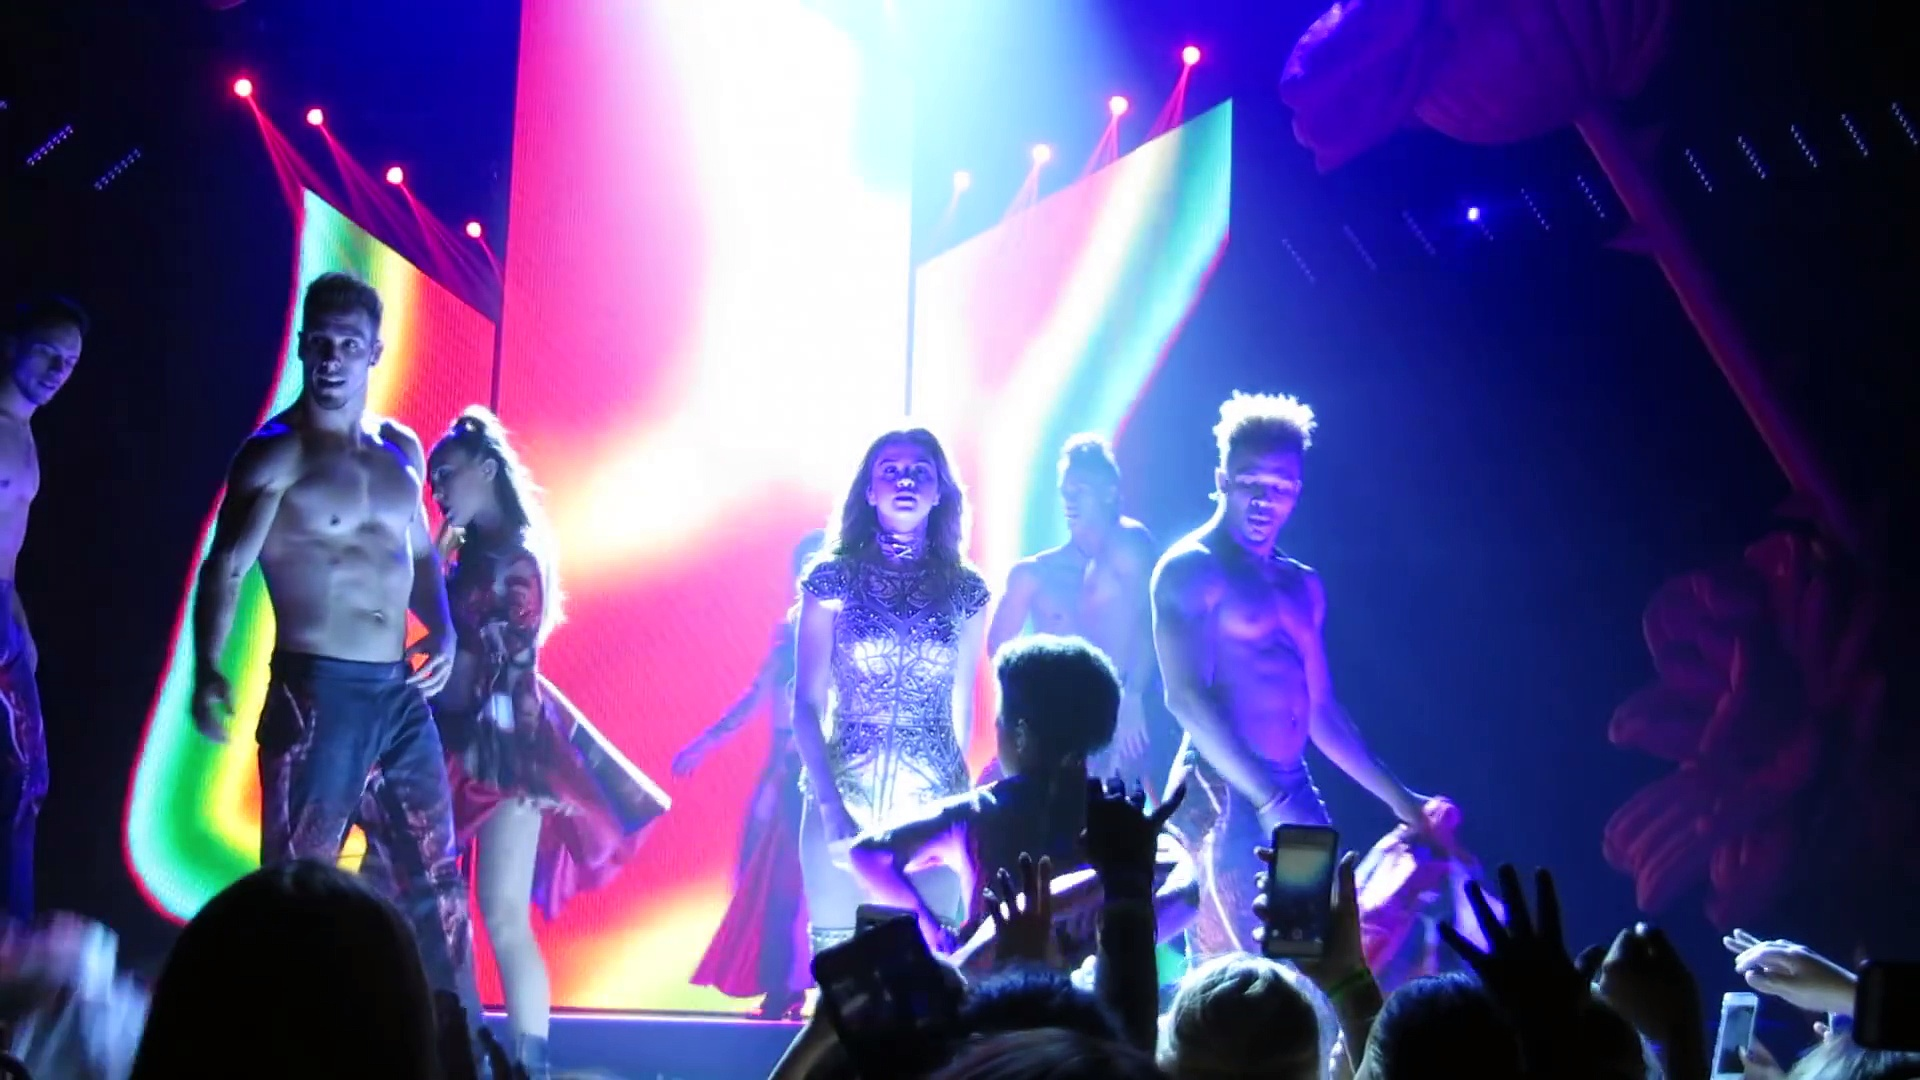 Selena Gomez - Body Heat |Selena Gomez Songs | Selena Gomez Instyle. http://bit.ly/2BuUAGT